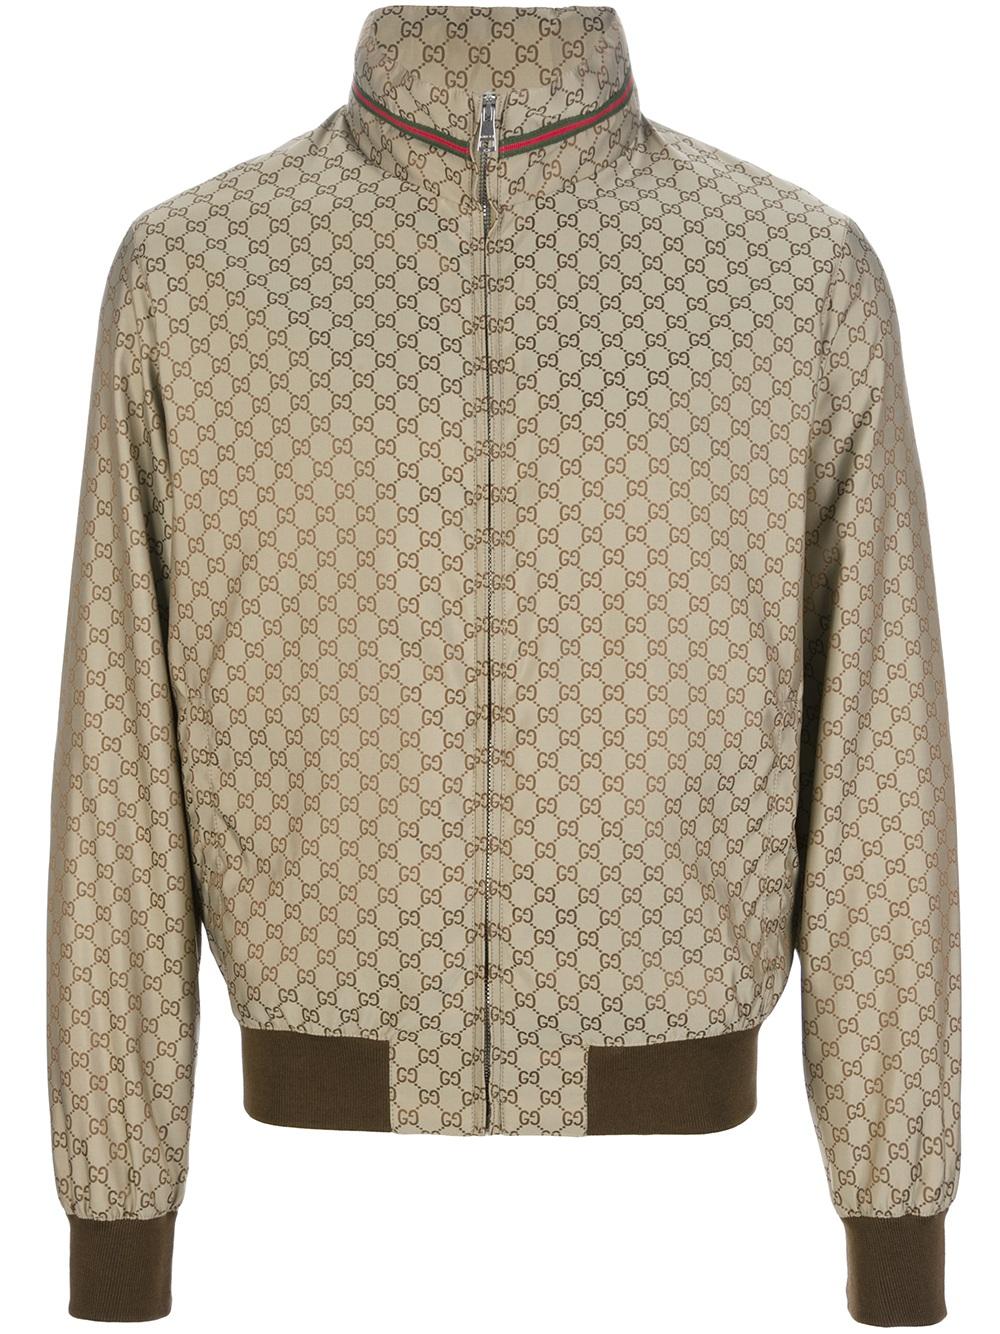 1cda8f34f Gucci Logo Print Bomber Jacket in Metallic for Men - Lyst